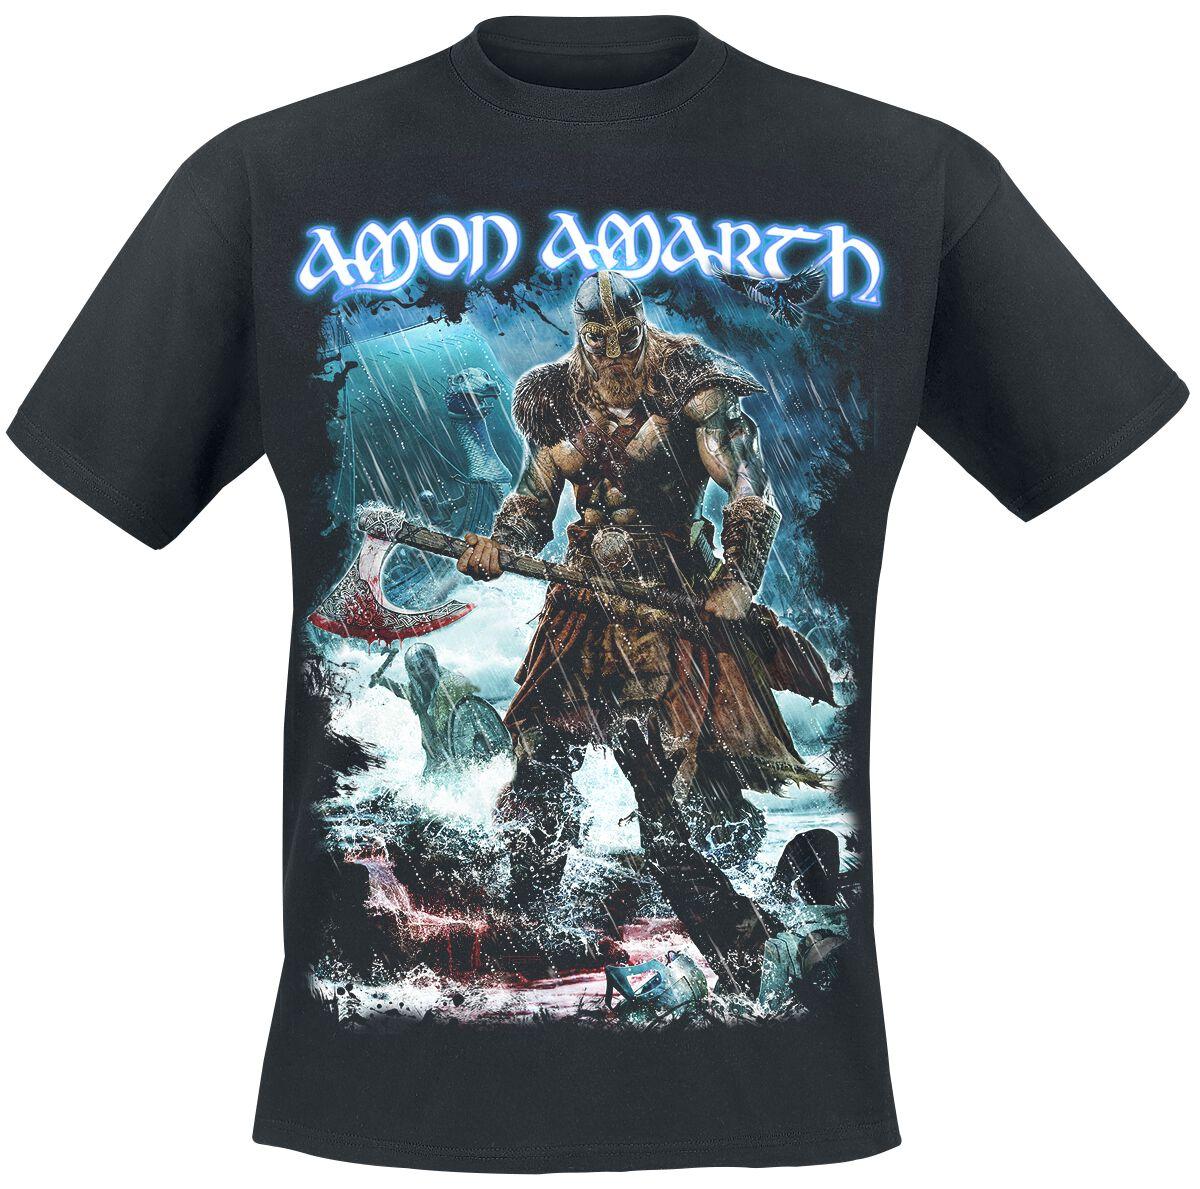 AMON AMARTH Jomsviking t-shirt BLACK clothing shirt toddler children BAND MUSIC